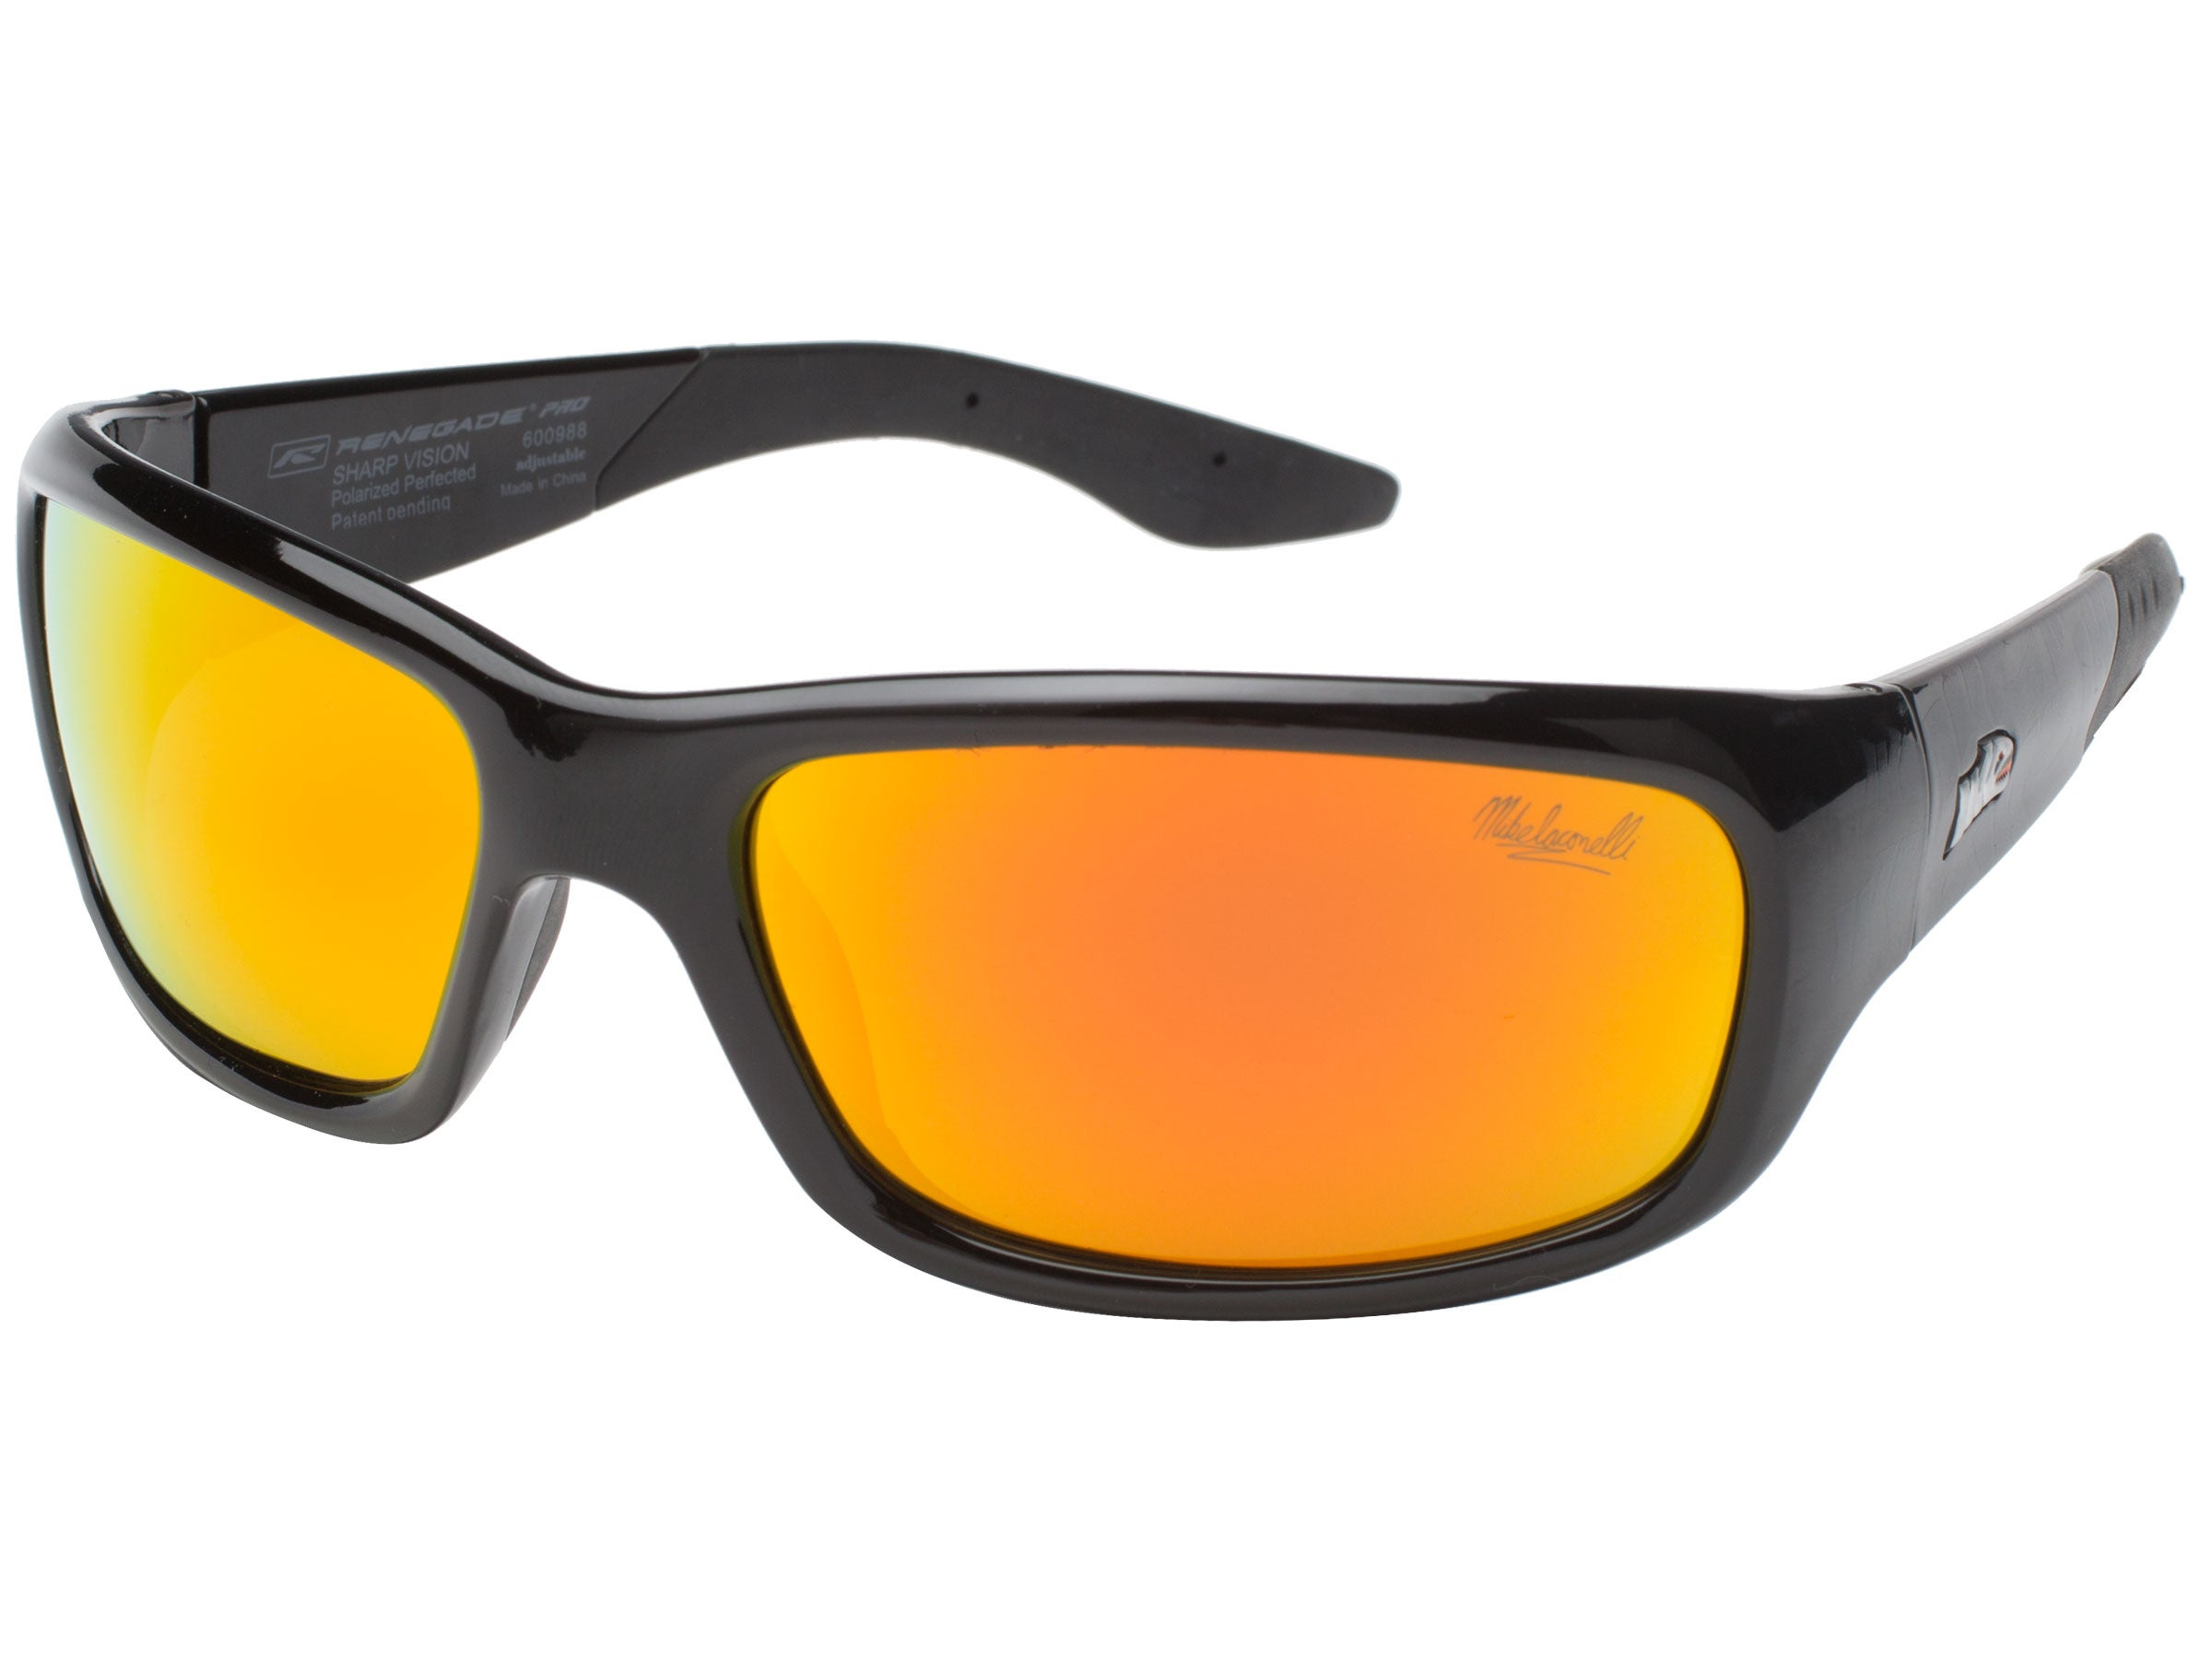 f7c0b69681 Renegade Mike Iaconelli Series Sunglasses